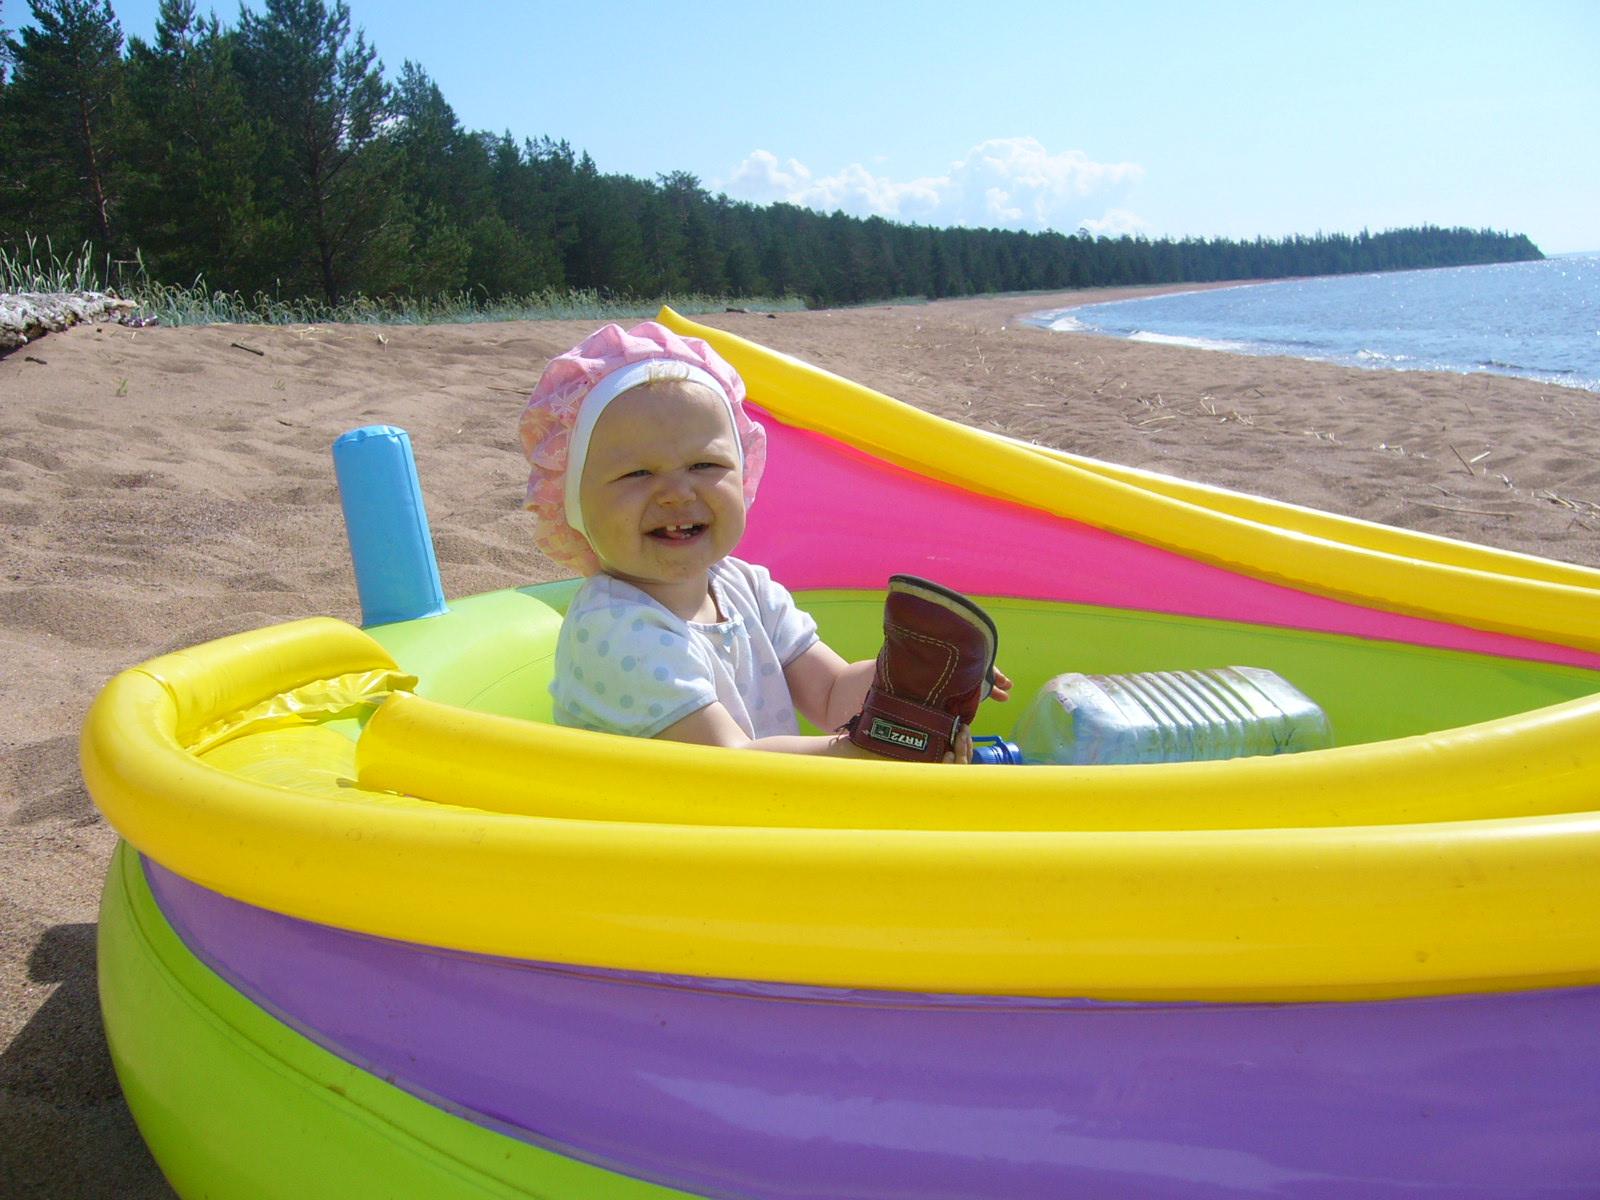 Вот так весело на море!. Лето, ах лето!..